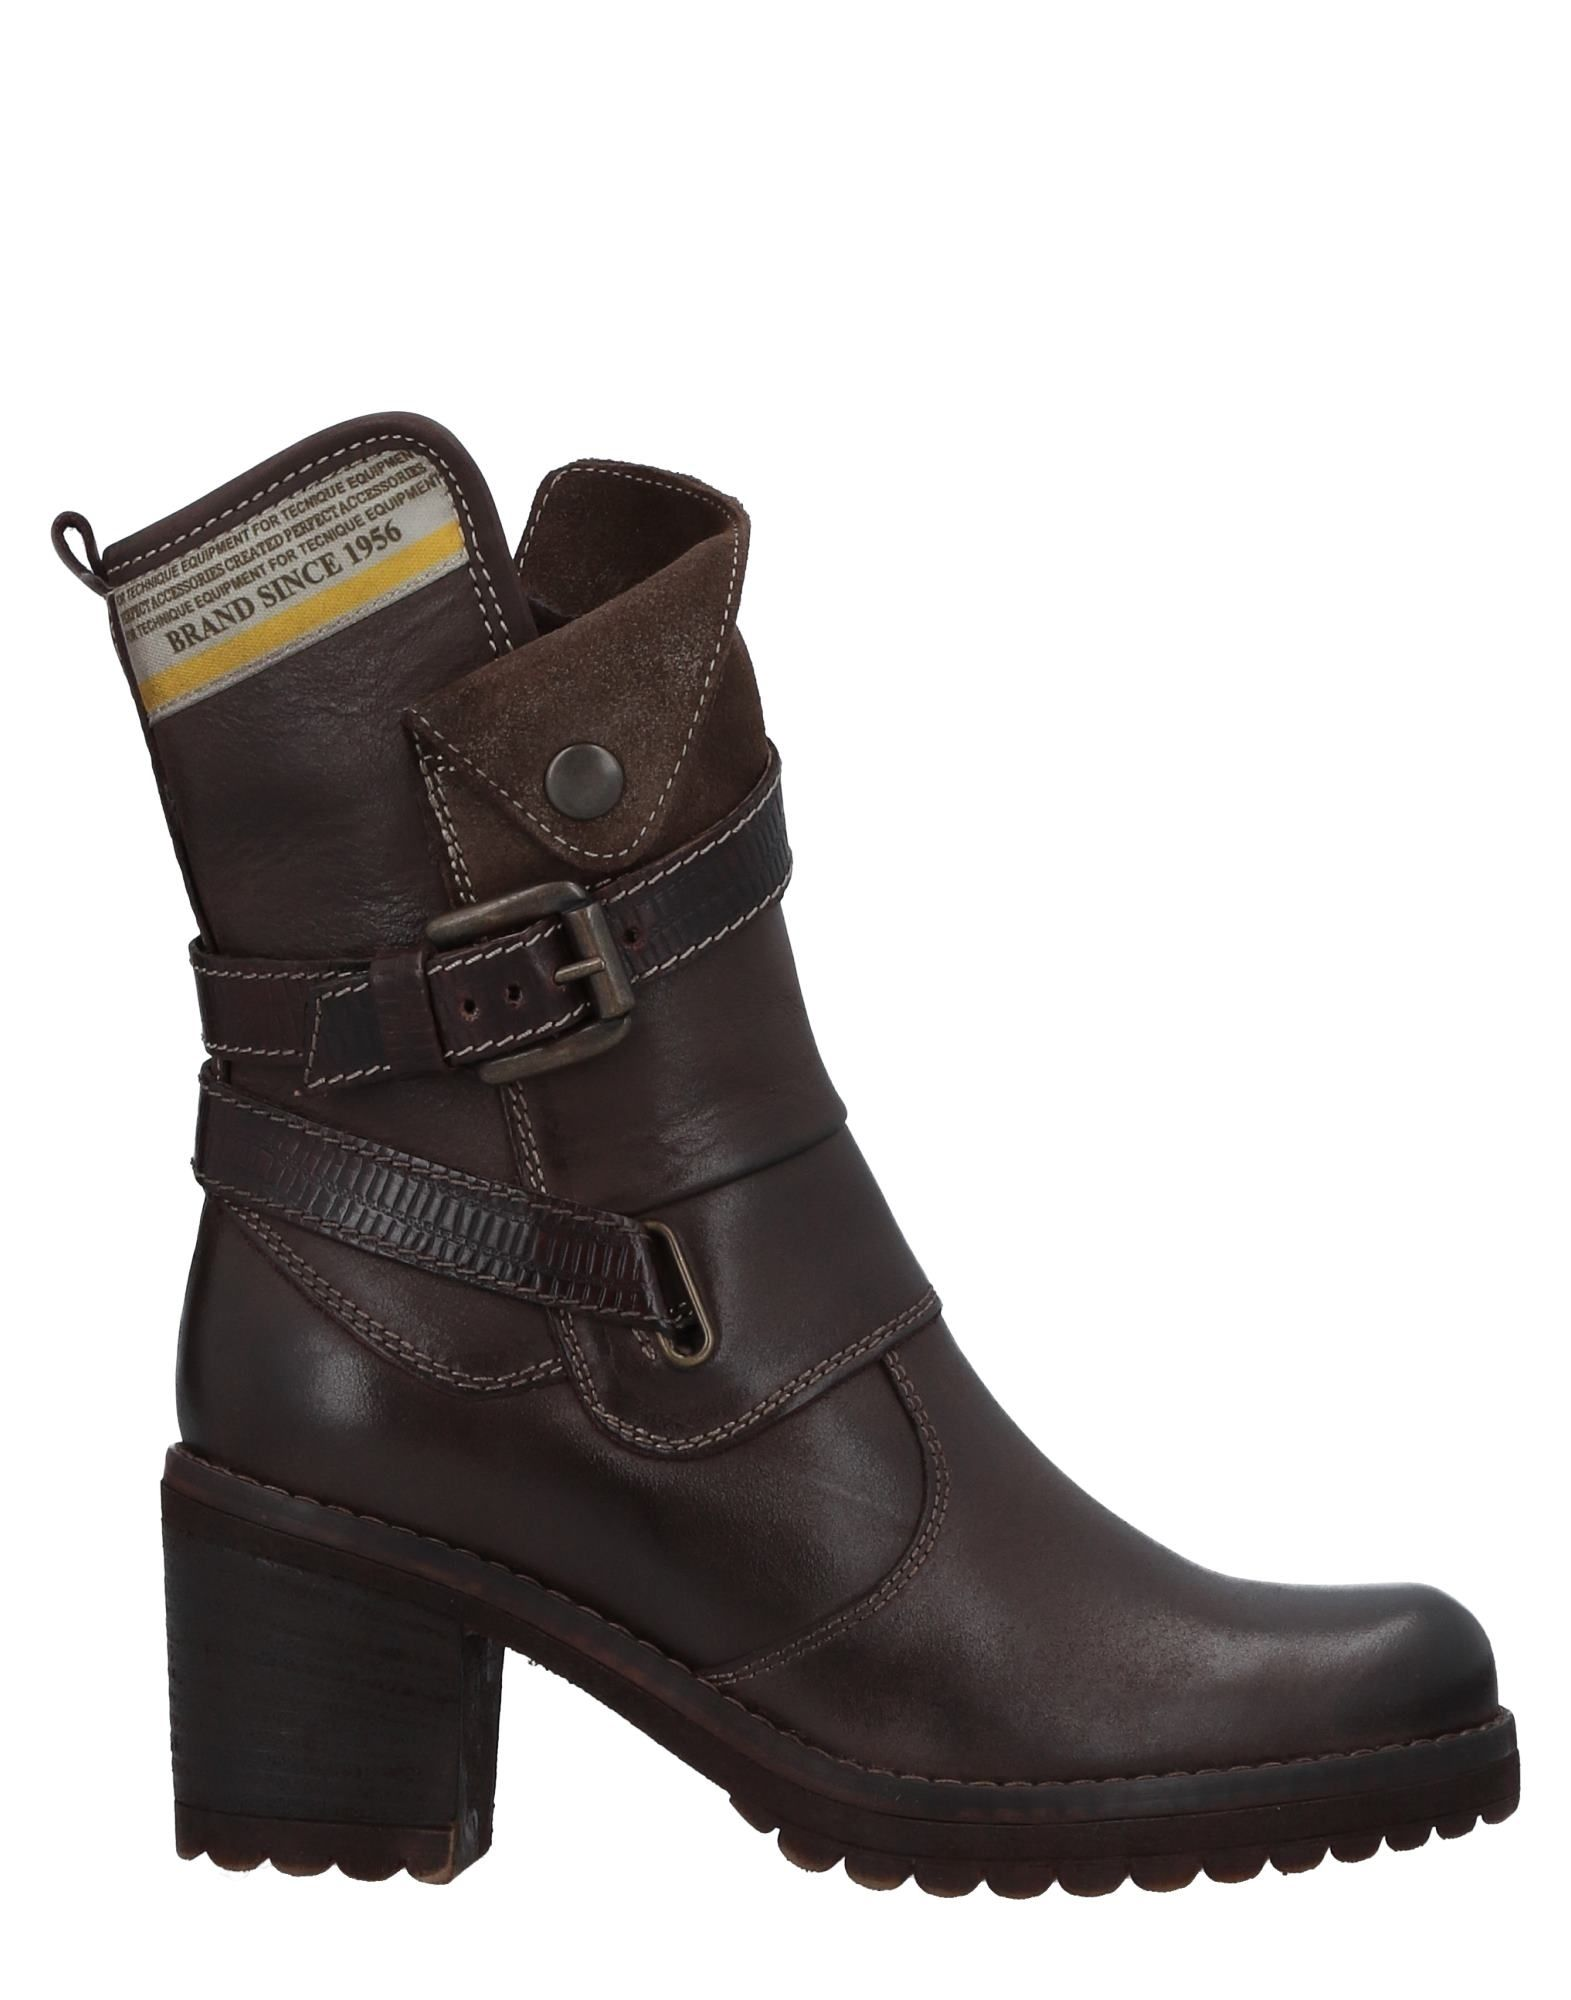 MANAS Ankle Boot in Dark Brown